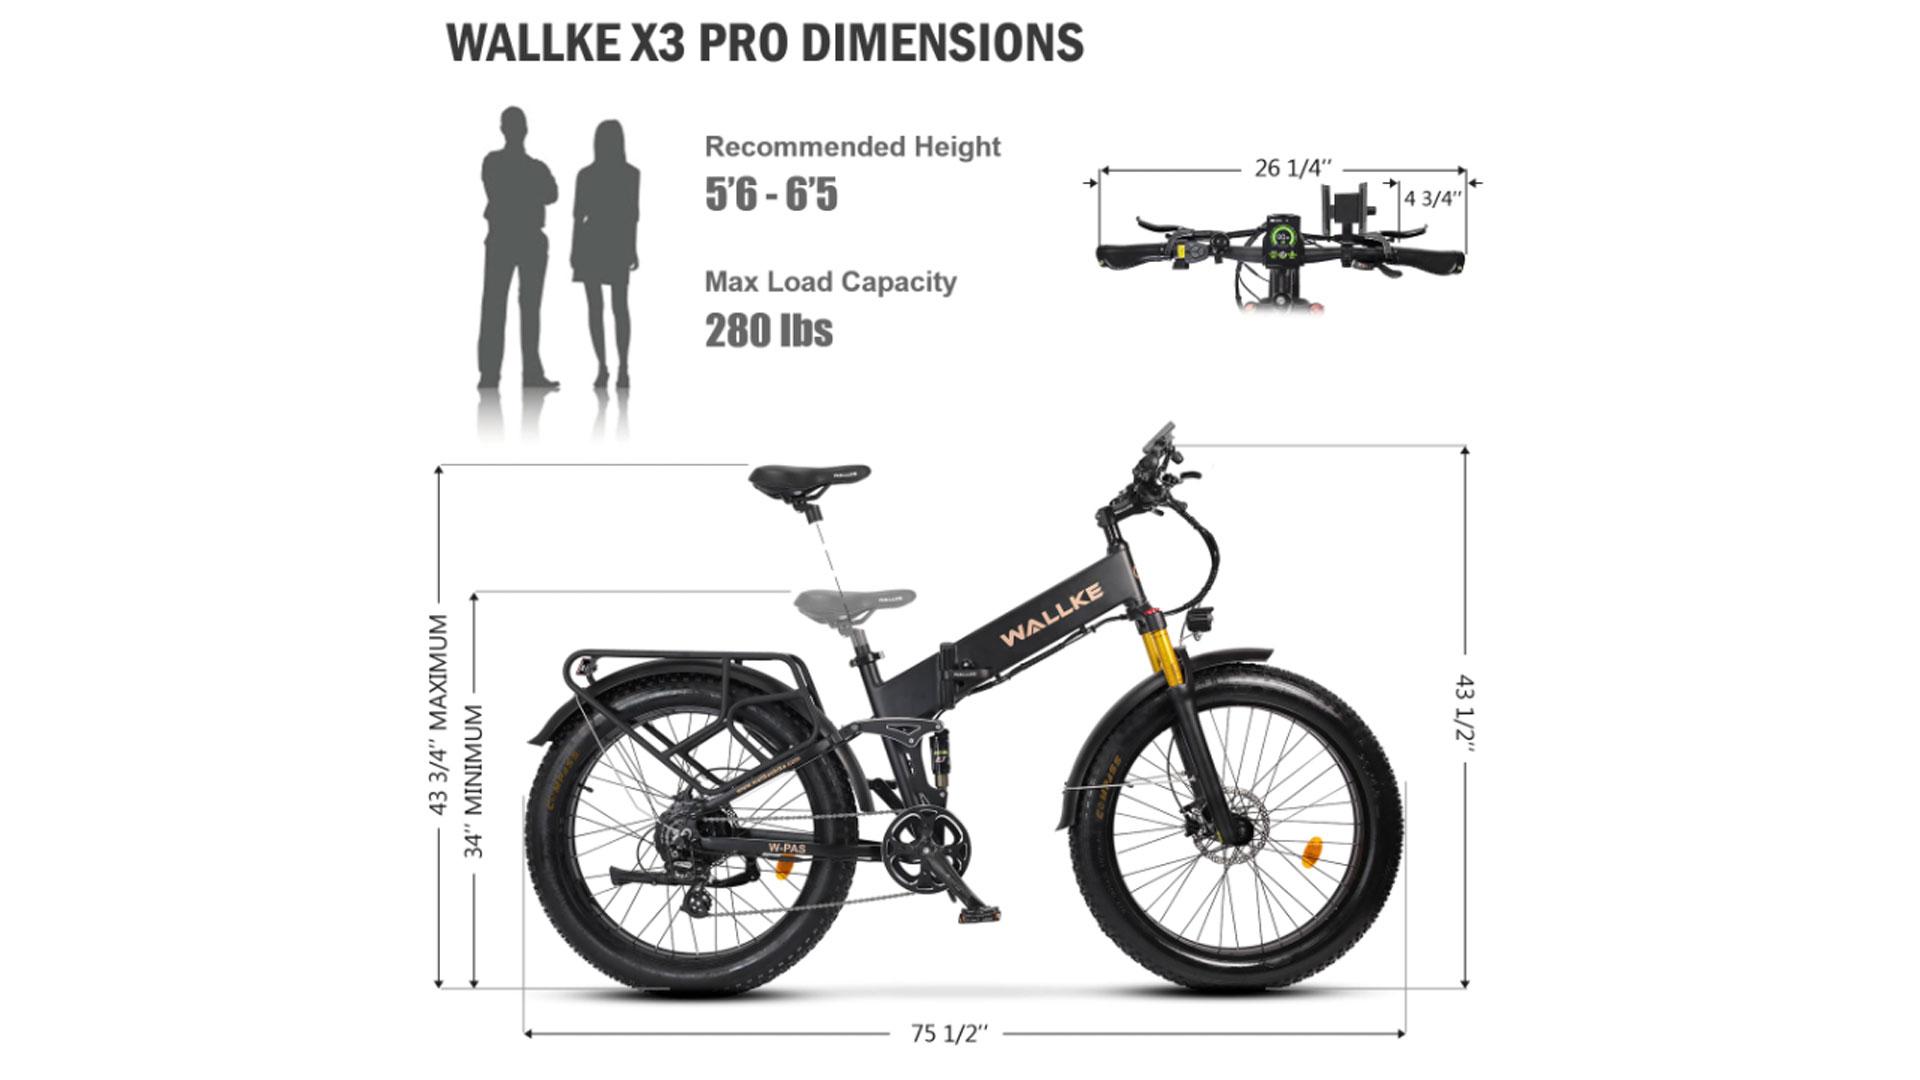 WALLKE X3 PRO road ebike bicicleta de montaña eléctrica bicicleta de tierra eléctrica e bicicleta para la venta la mejor bicicleta eléctrica